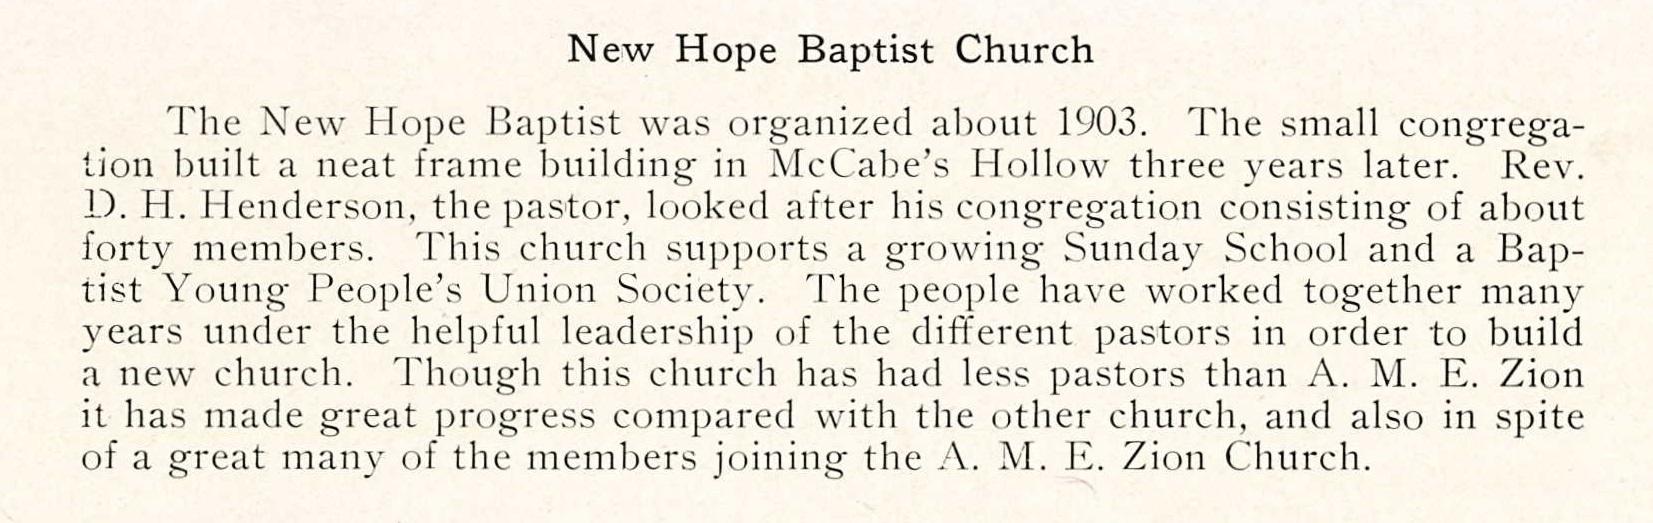 New Hope Baptist Church - 1924 Coraopolis HS Review (107).jpg